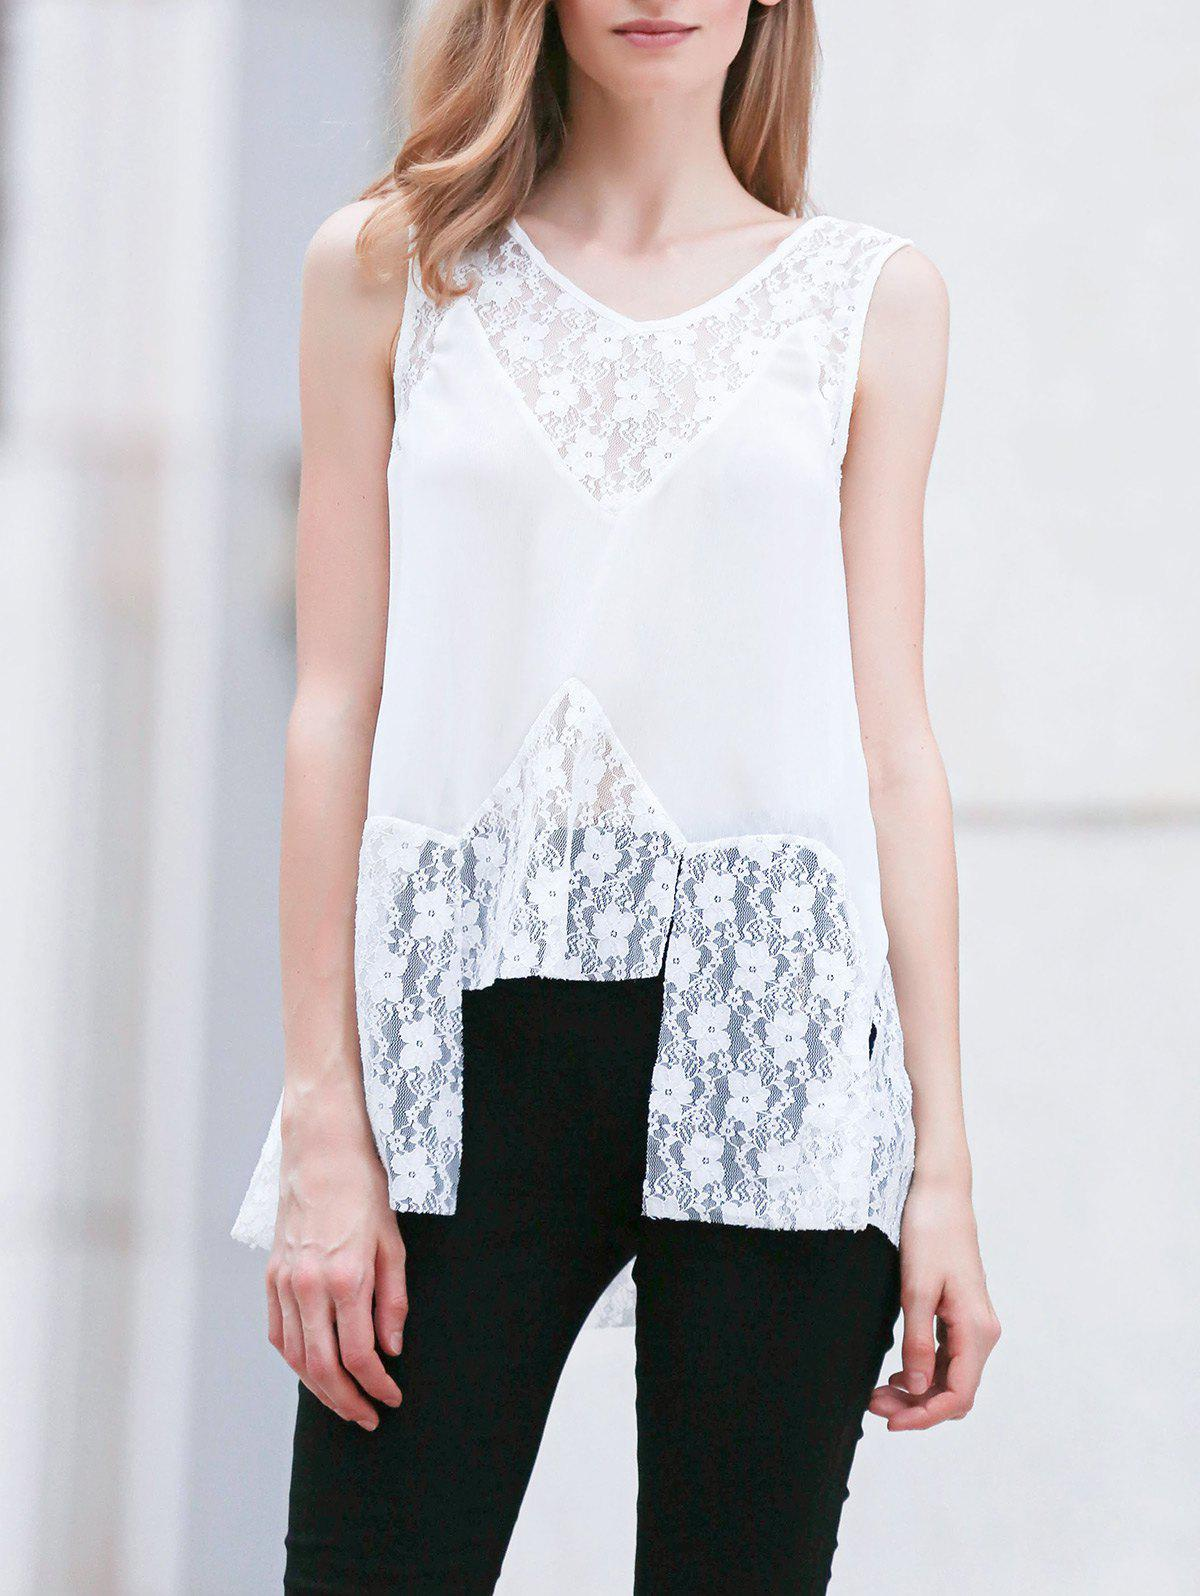 Lace Splice V Neck Sleeveless White Blouse 177344504